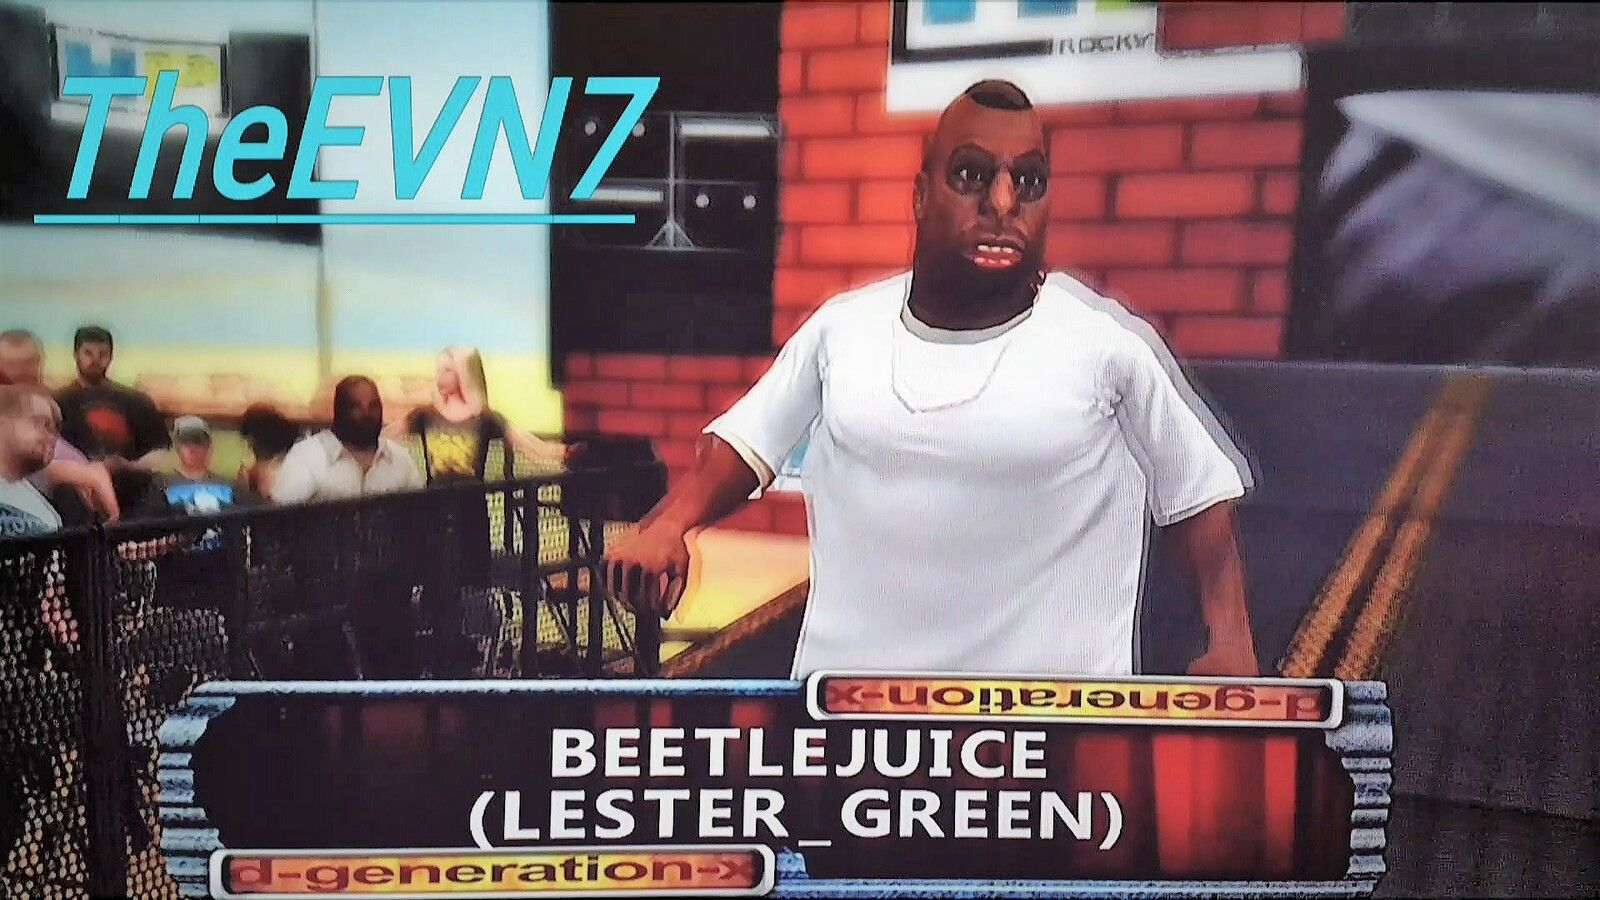 Lester Green Beetlejuice Wallpapers Top Free Lester Green Beetlejuice Backgrounds Wallpaperaccess